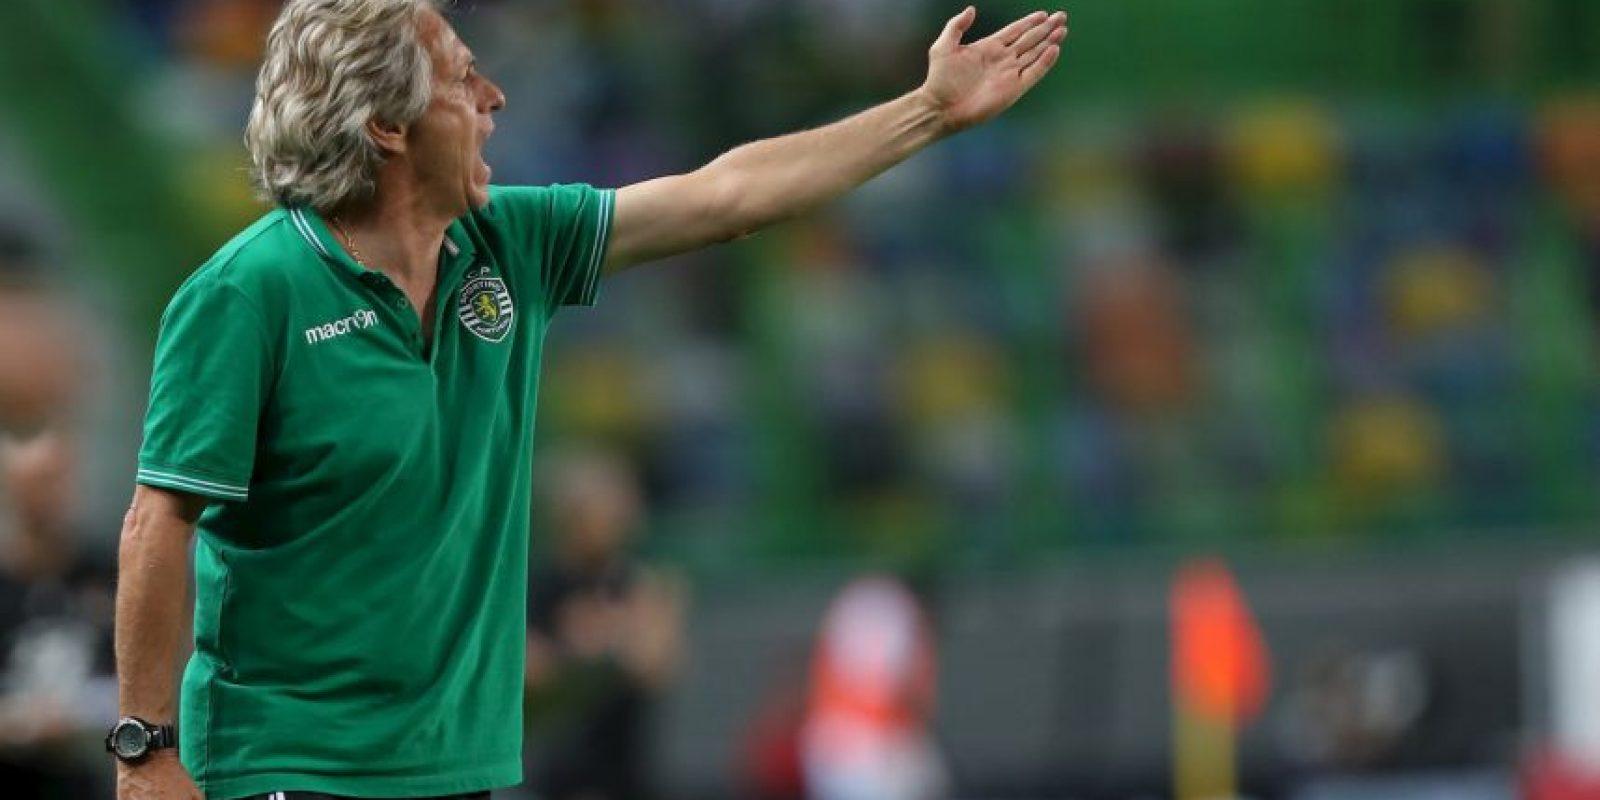 10.-Jorge Jesus (Sporting Lisboa) Foto:Getty Images